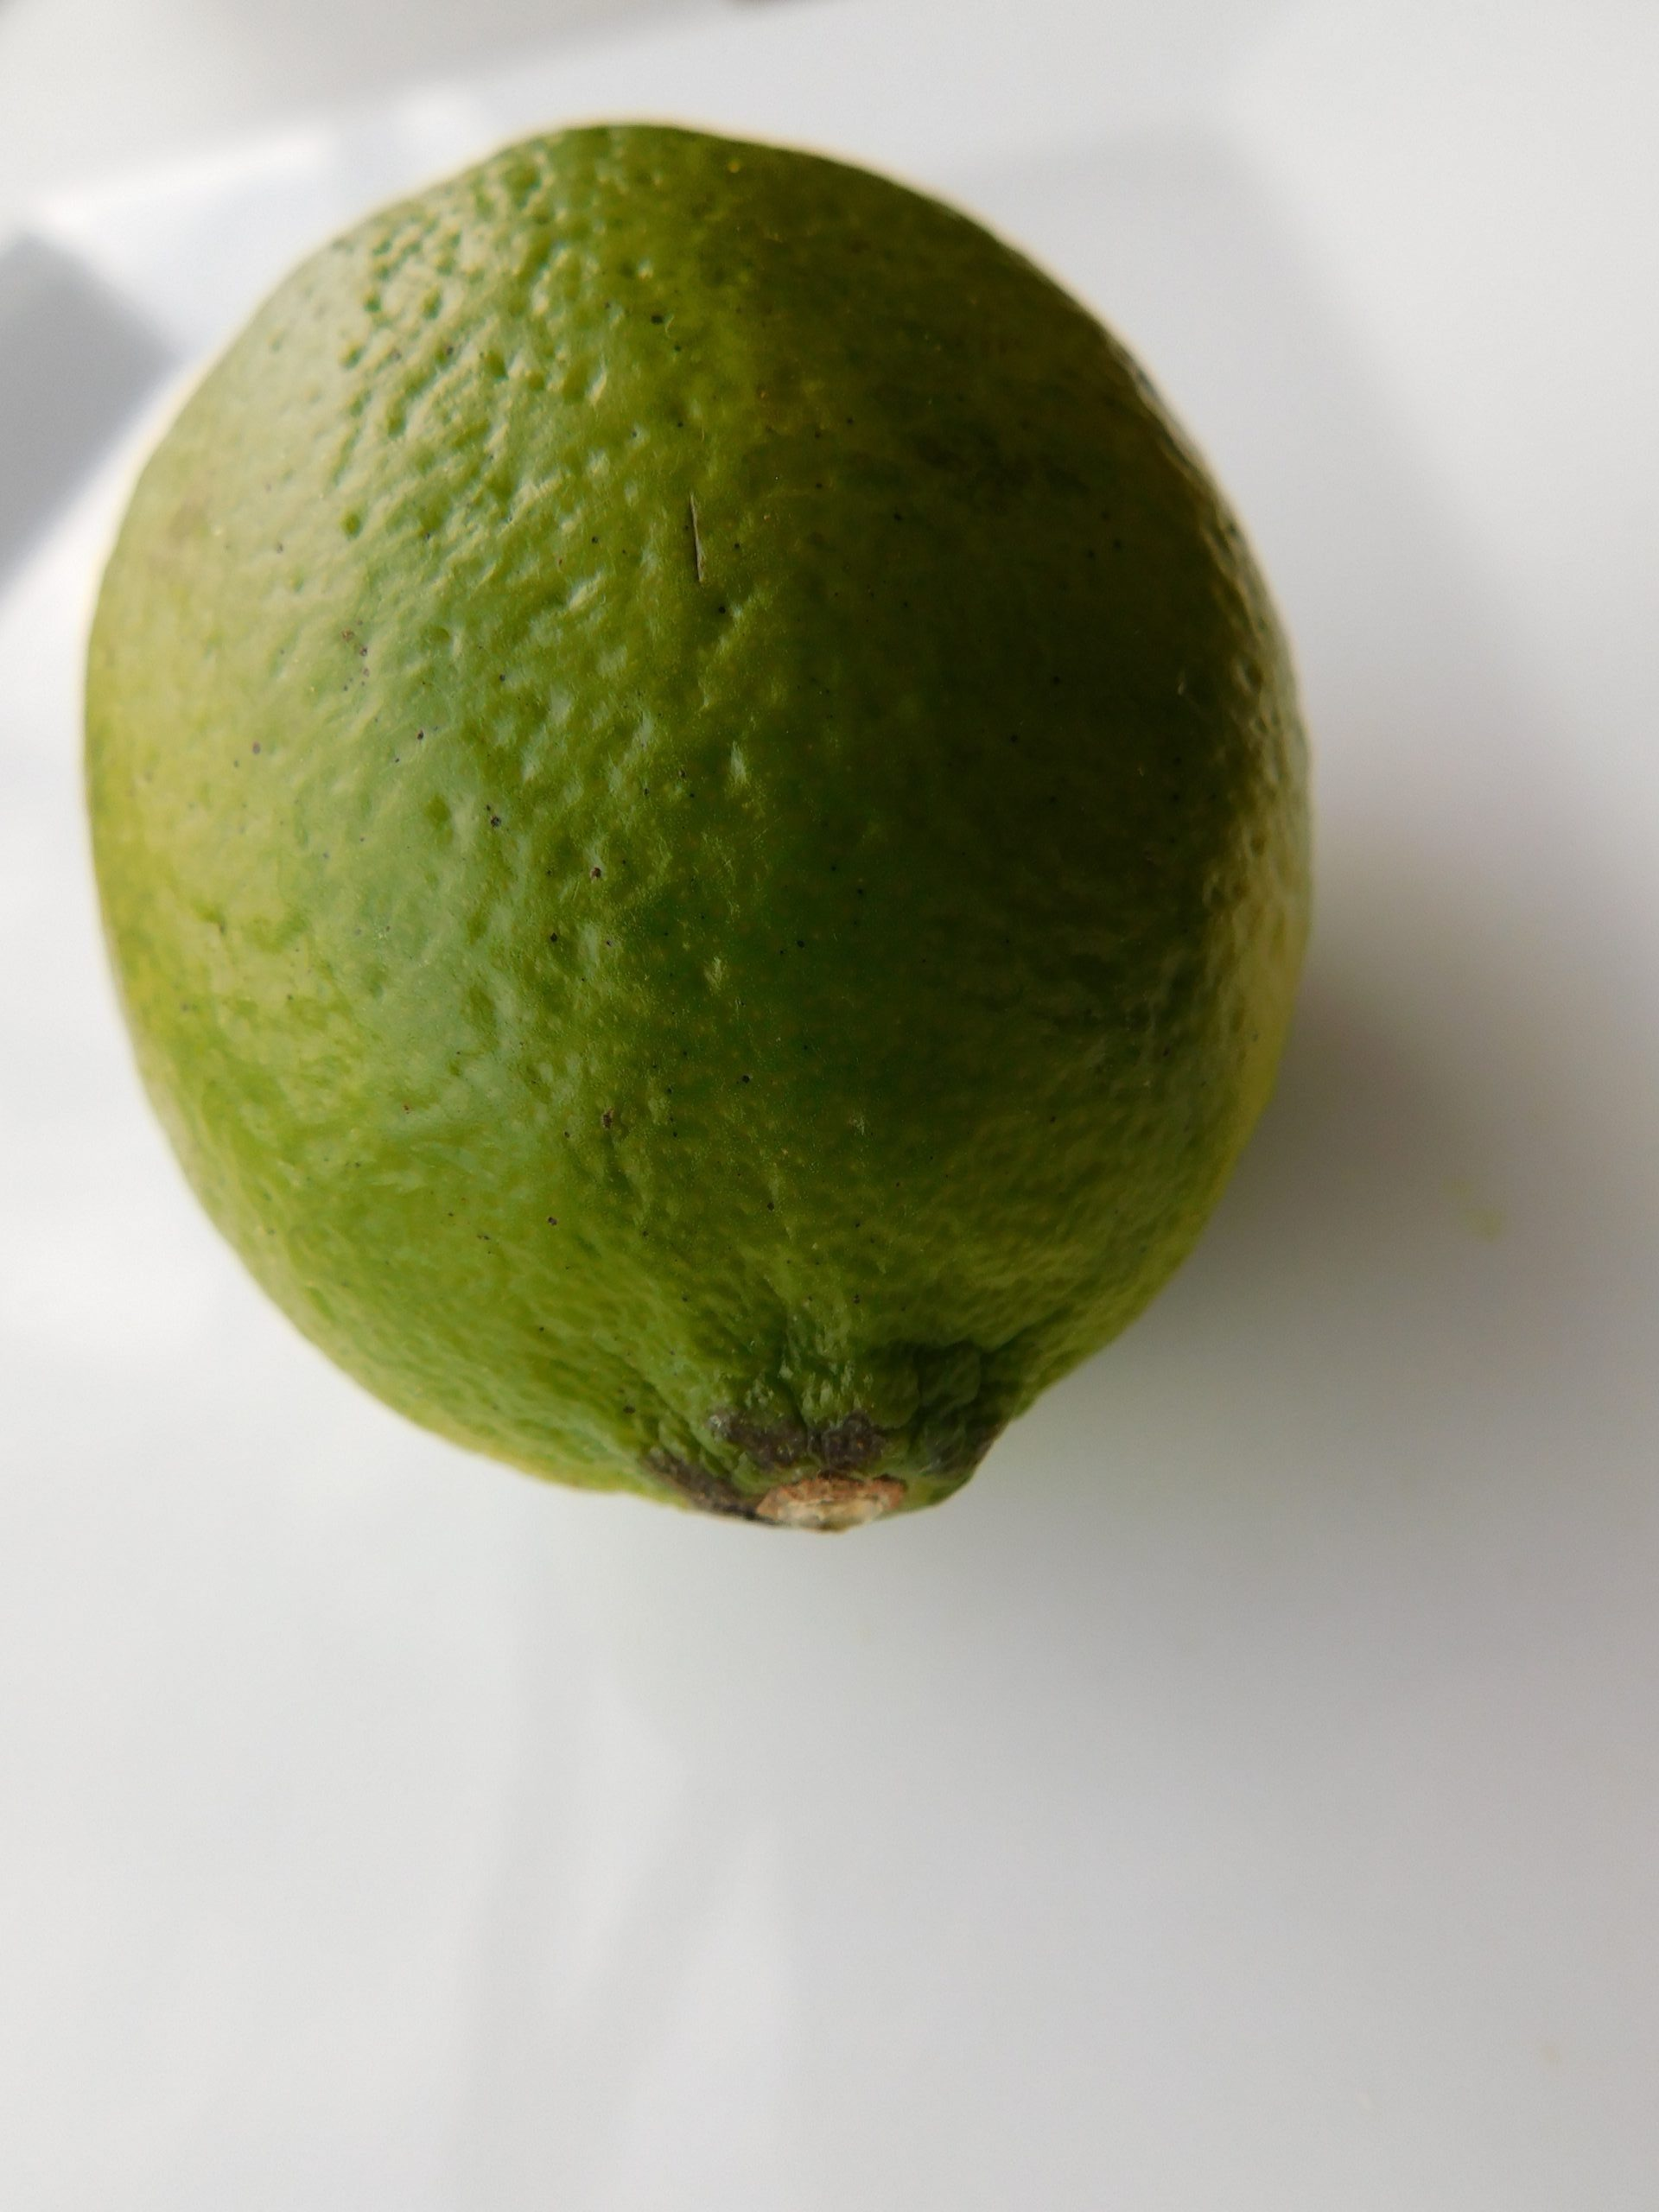 How Does Lime Taste